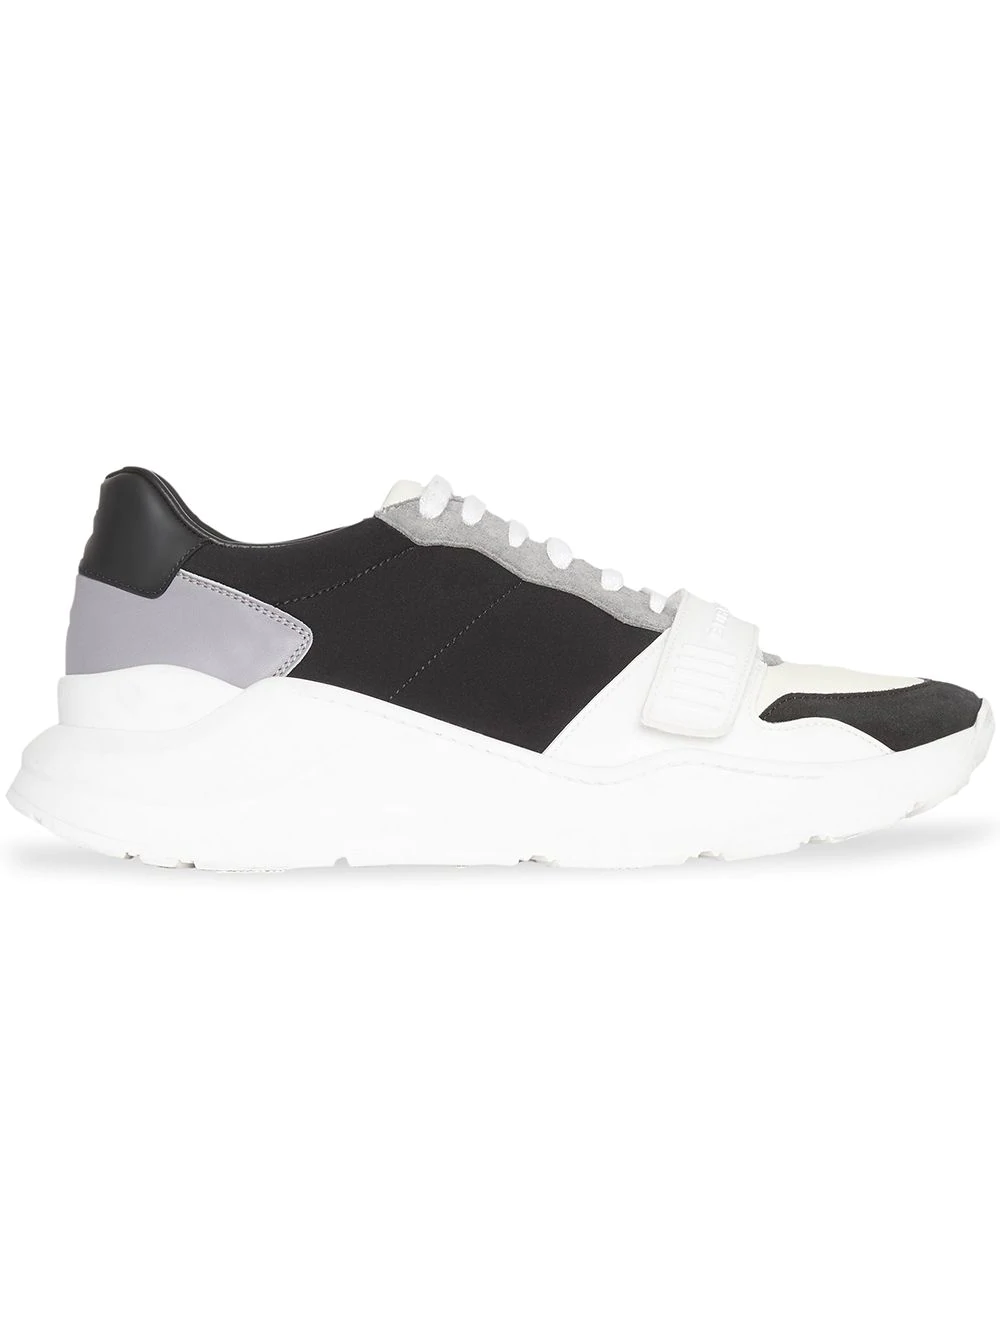 49b1e0898b4c Burberry Men s Regis Neoprene   Leather Low-Top Sneakers In White ...